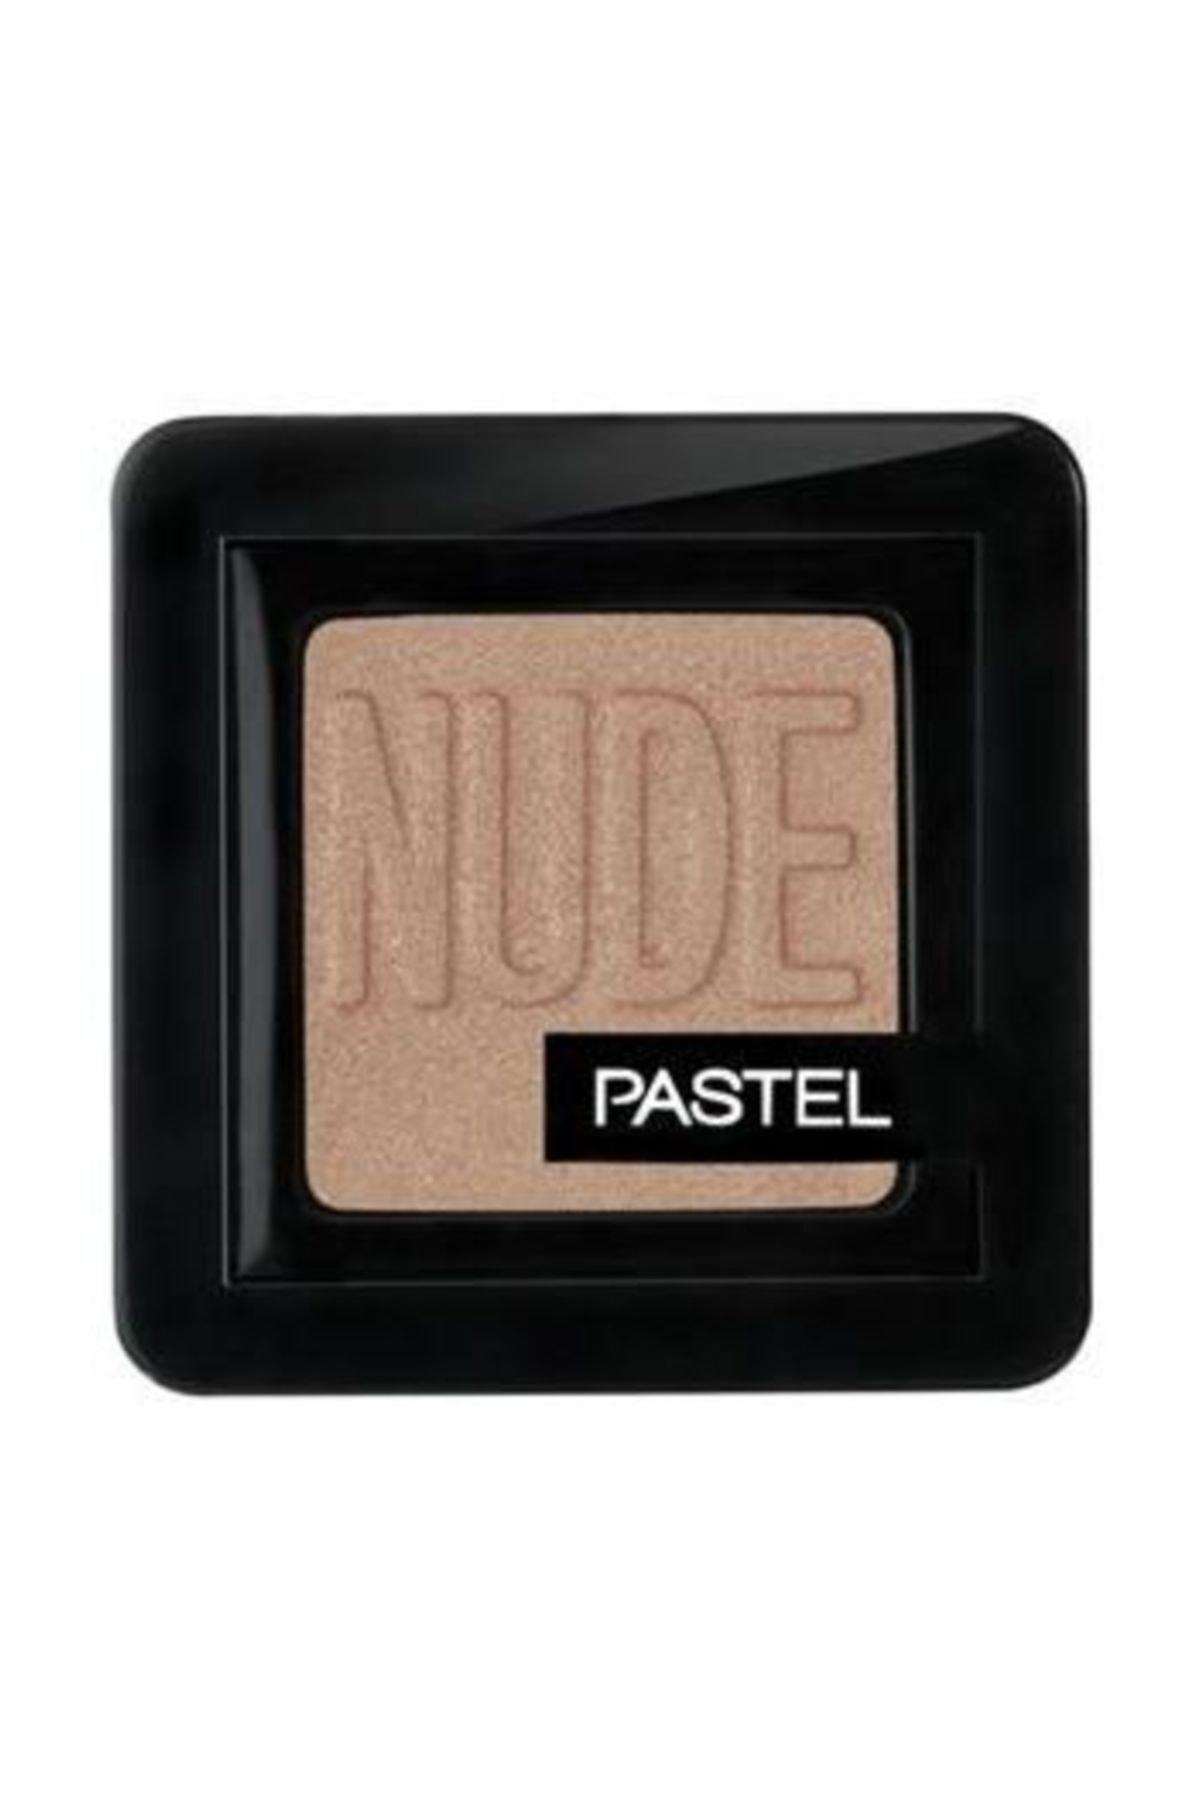 Pastel GözFarı - Nude Single Eyeshadow No 80 8690644017803 1